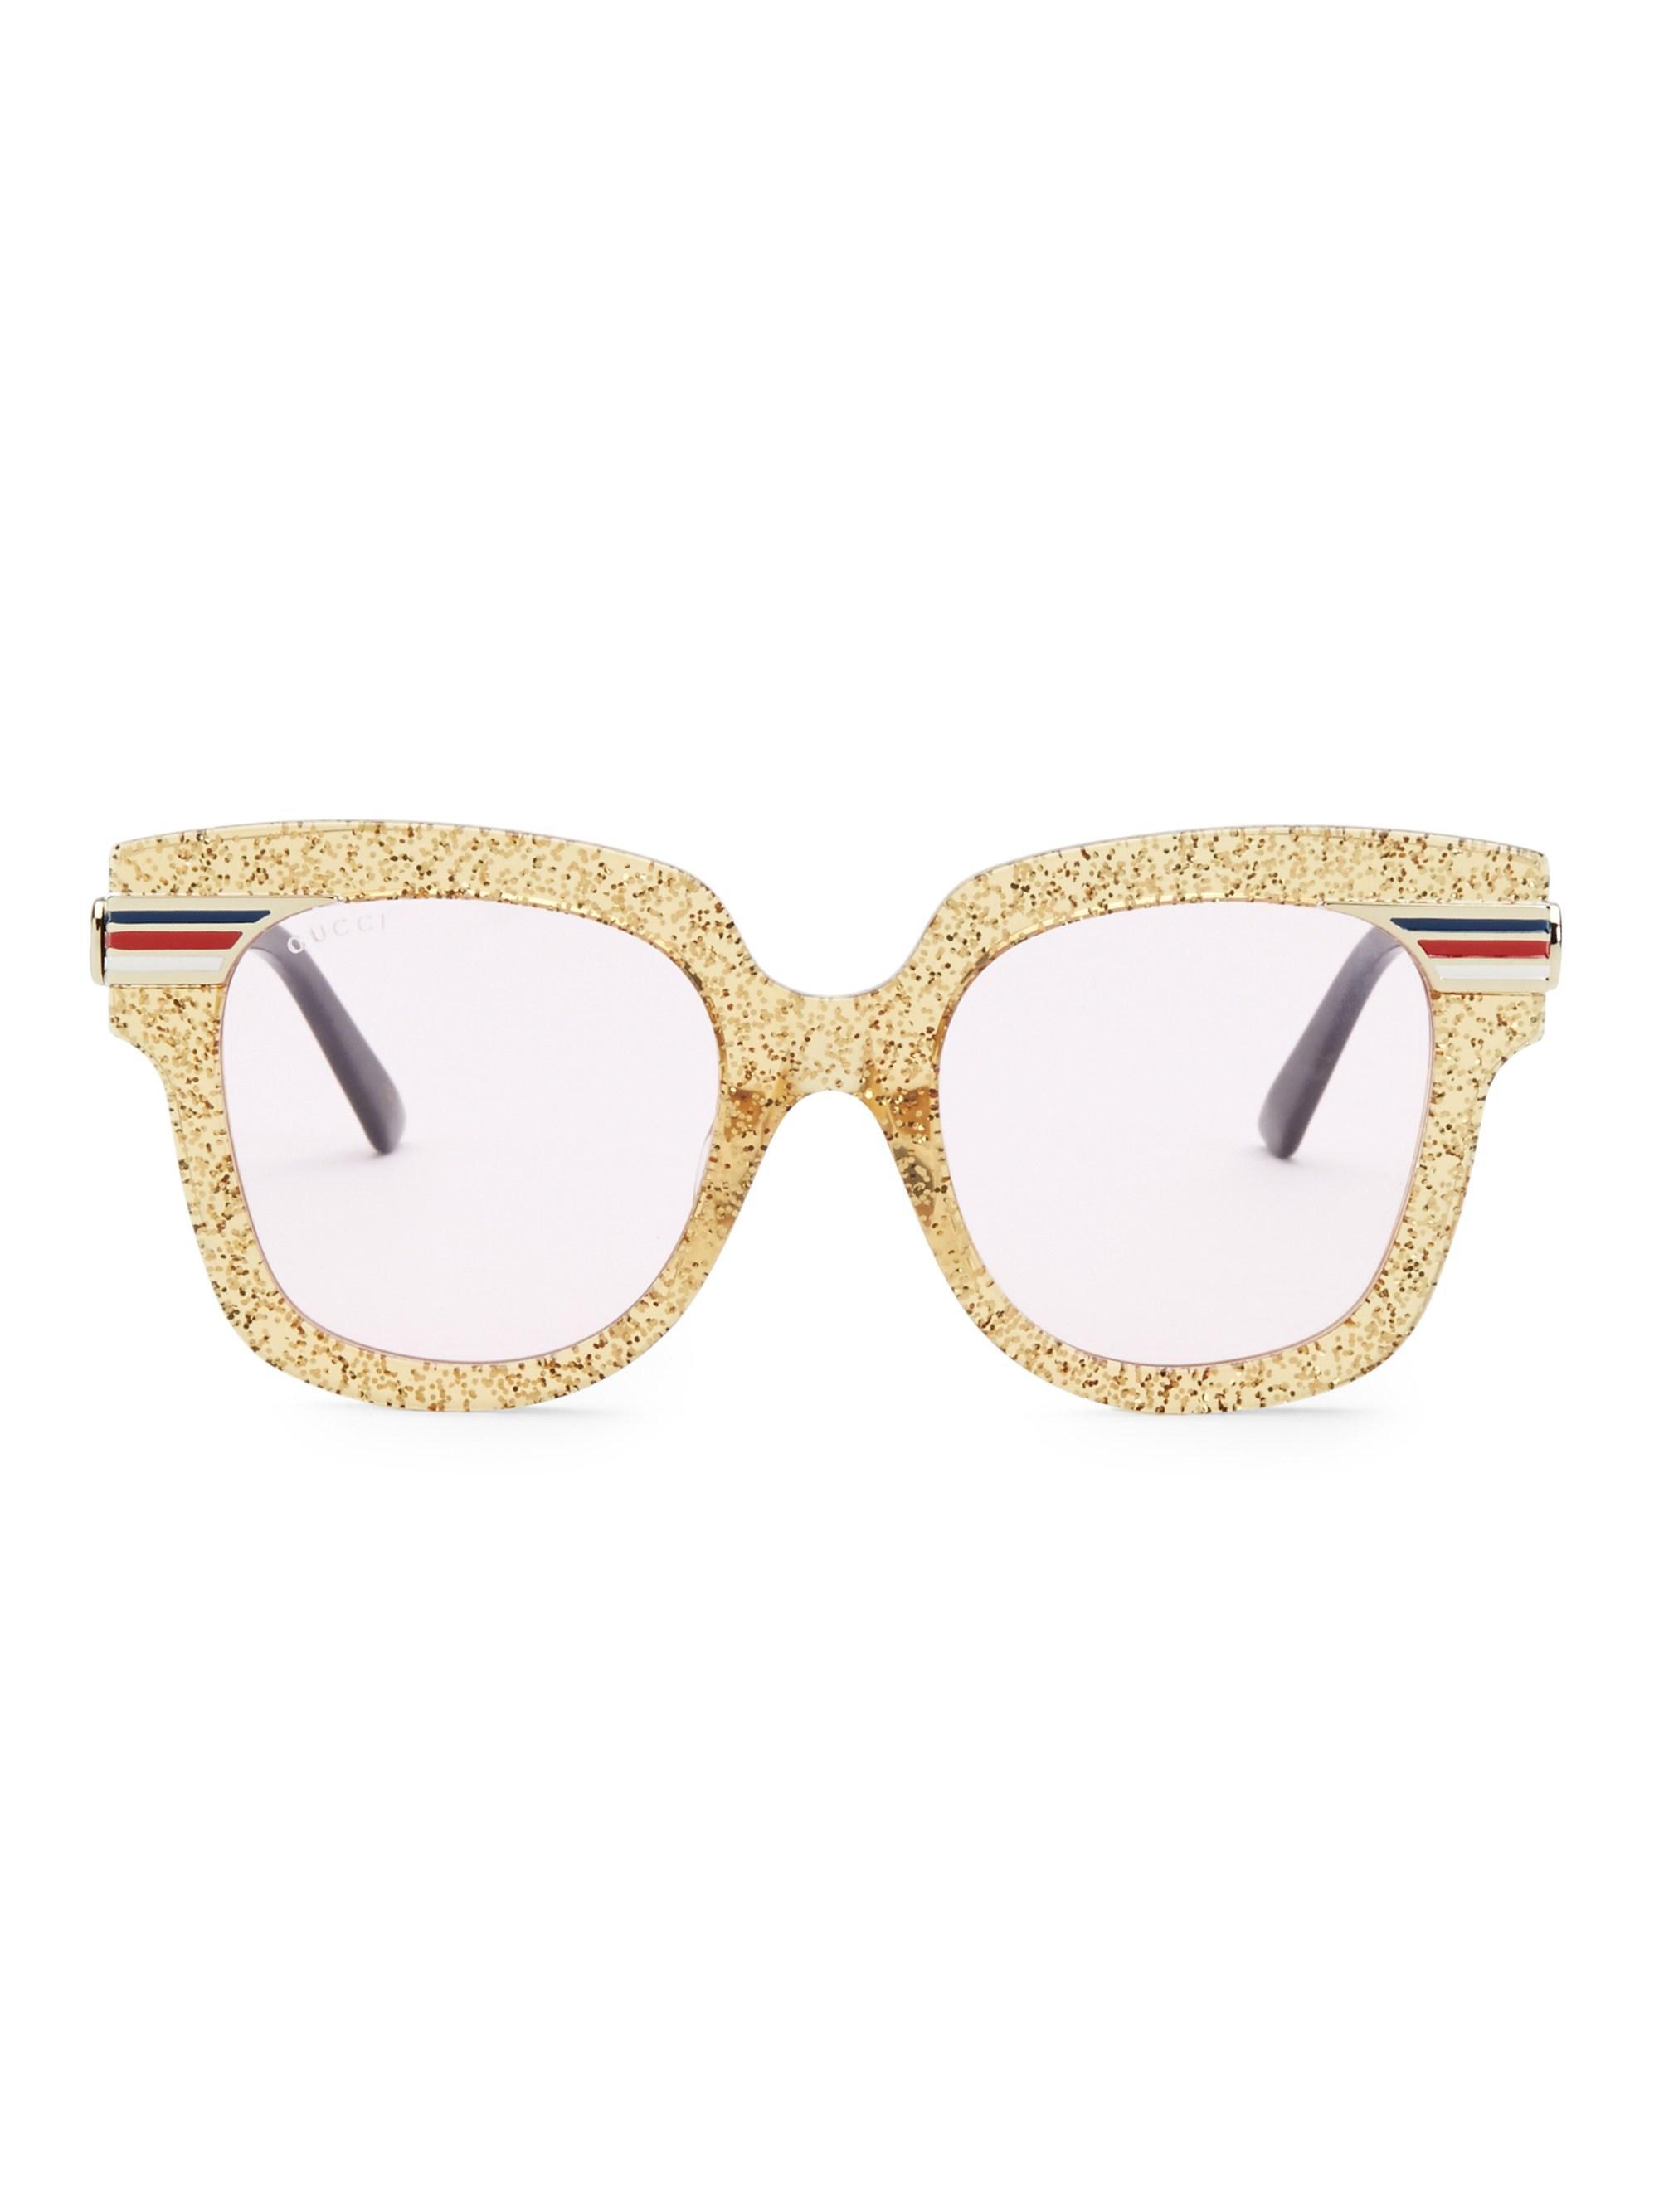 b3a1001169 Lyst - Gucci Women s 51mm Square Sunglasses - Pink Gold